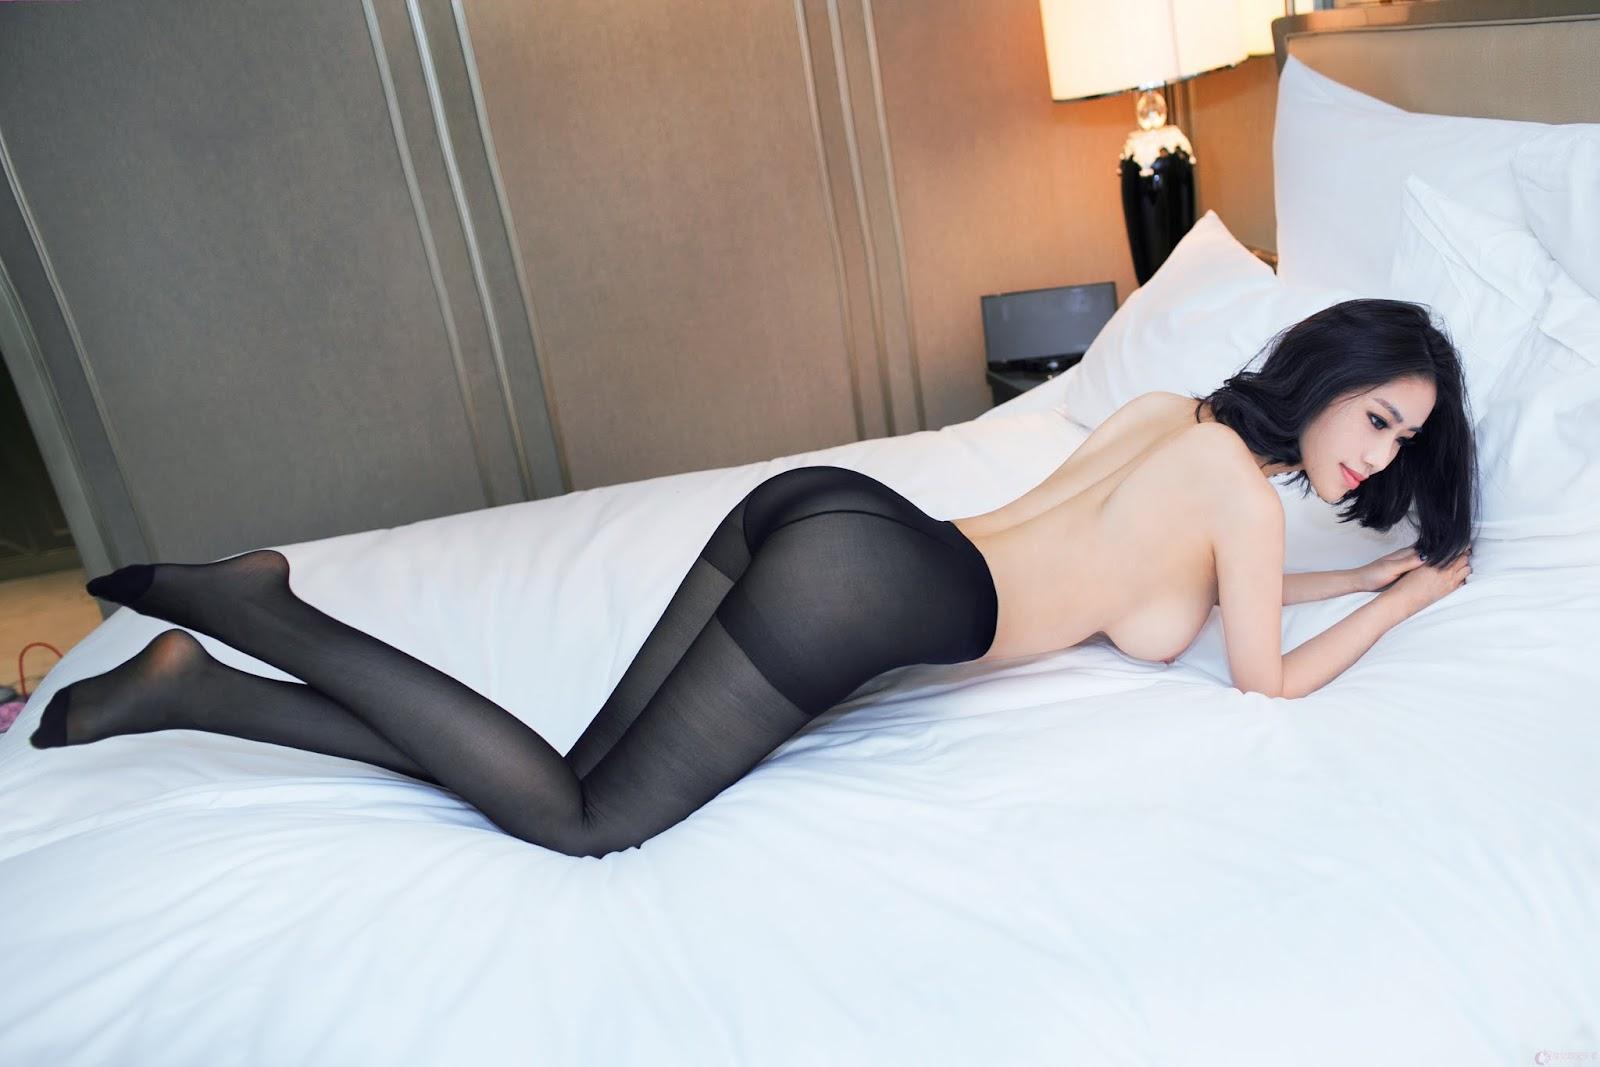 %252B%25C2%25A6%252B%2529%2B%252804%2529 - Hot Girl TUIGIRL NO.53 Sexy